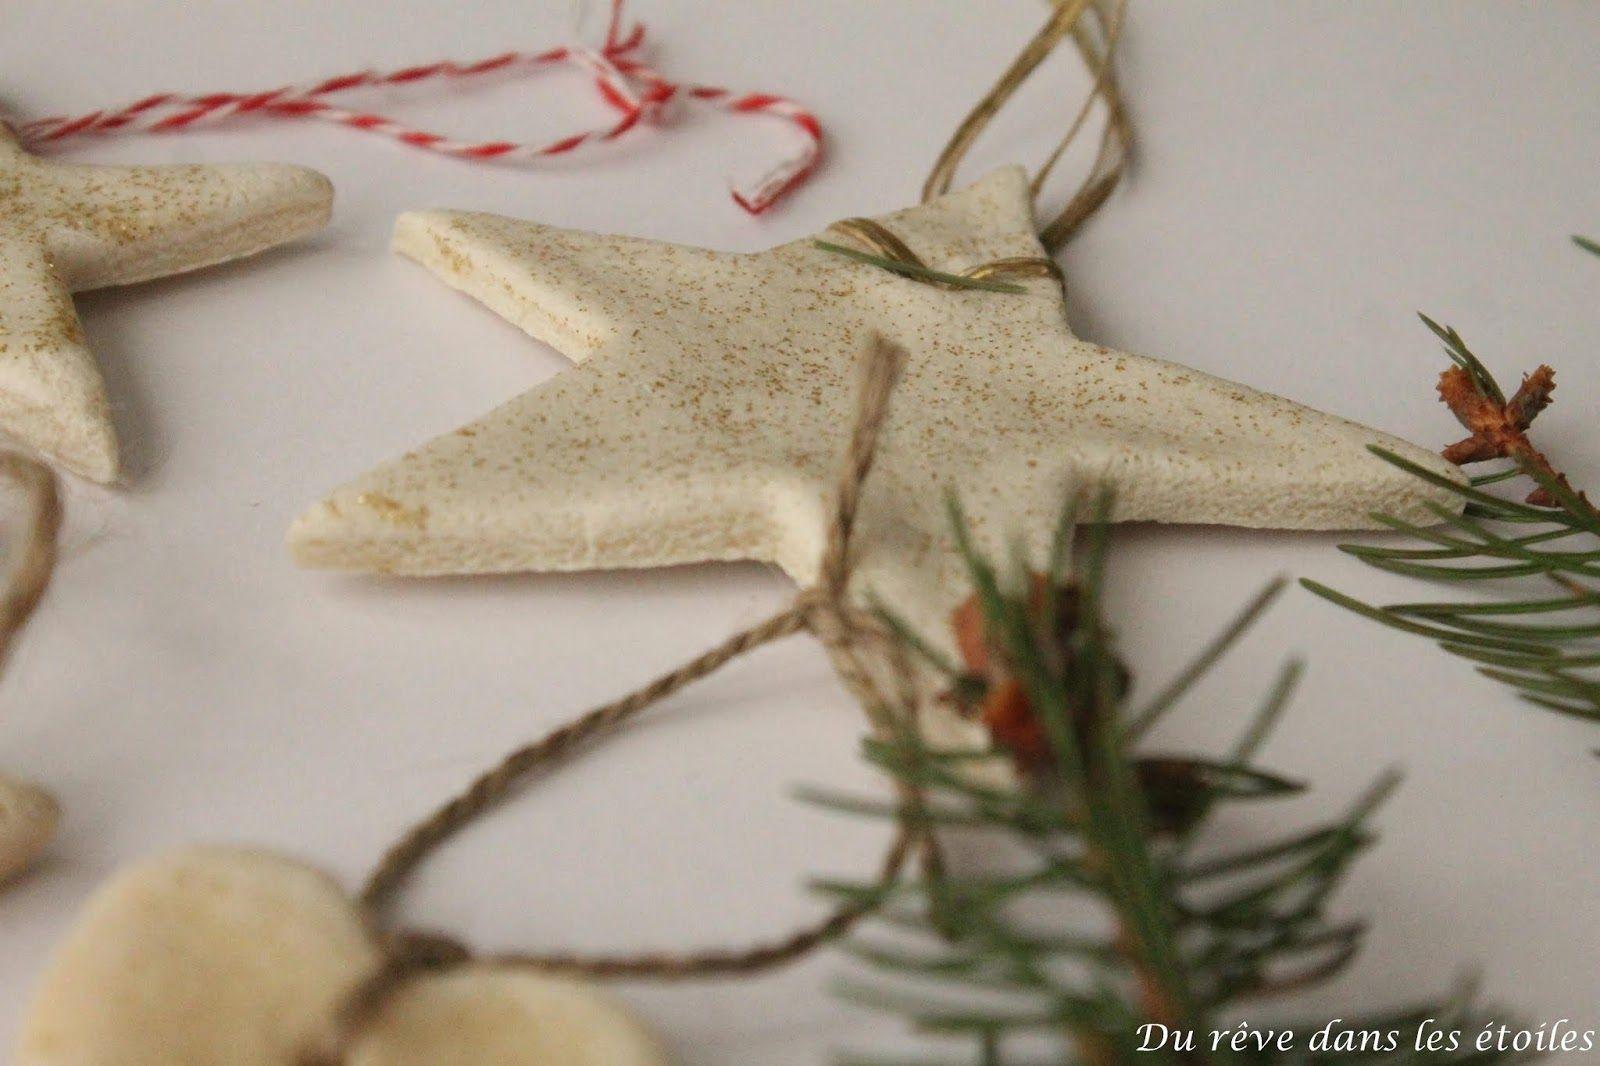 Noël 2019, ornements en pâte à sel - suite #pateasel #pâteàsel #noel #christmas #christmastime #xmas #activitenoel #ornements #decorationdesapin #treeornament #suspensionsapin #durevedanslesetoiles #eclatezvotrebulle #kids #recettepâteàsel #recettepateasel #slowconsommation #slowlife #ralentir #vivresimplement #slowdecoration #slowchristmas #0dechet #maisonzerodechet #famillezerodechet #zerowaste #zerodechet #ornamentsideas